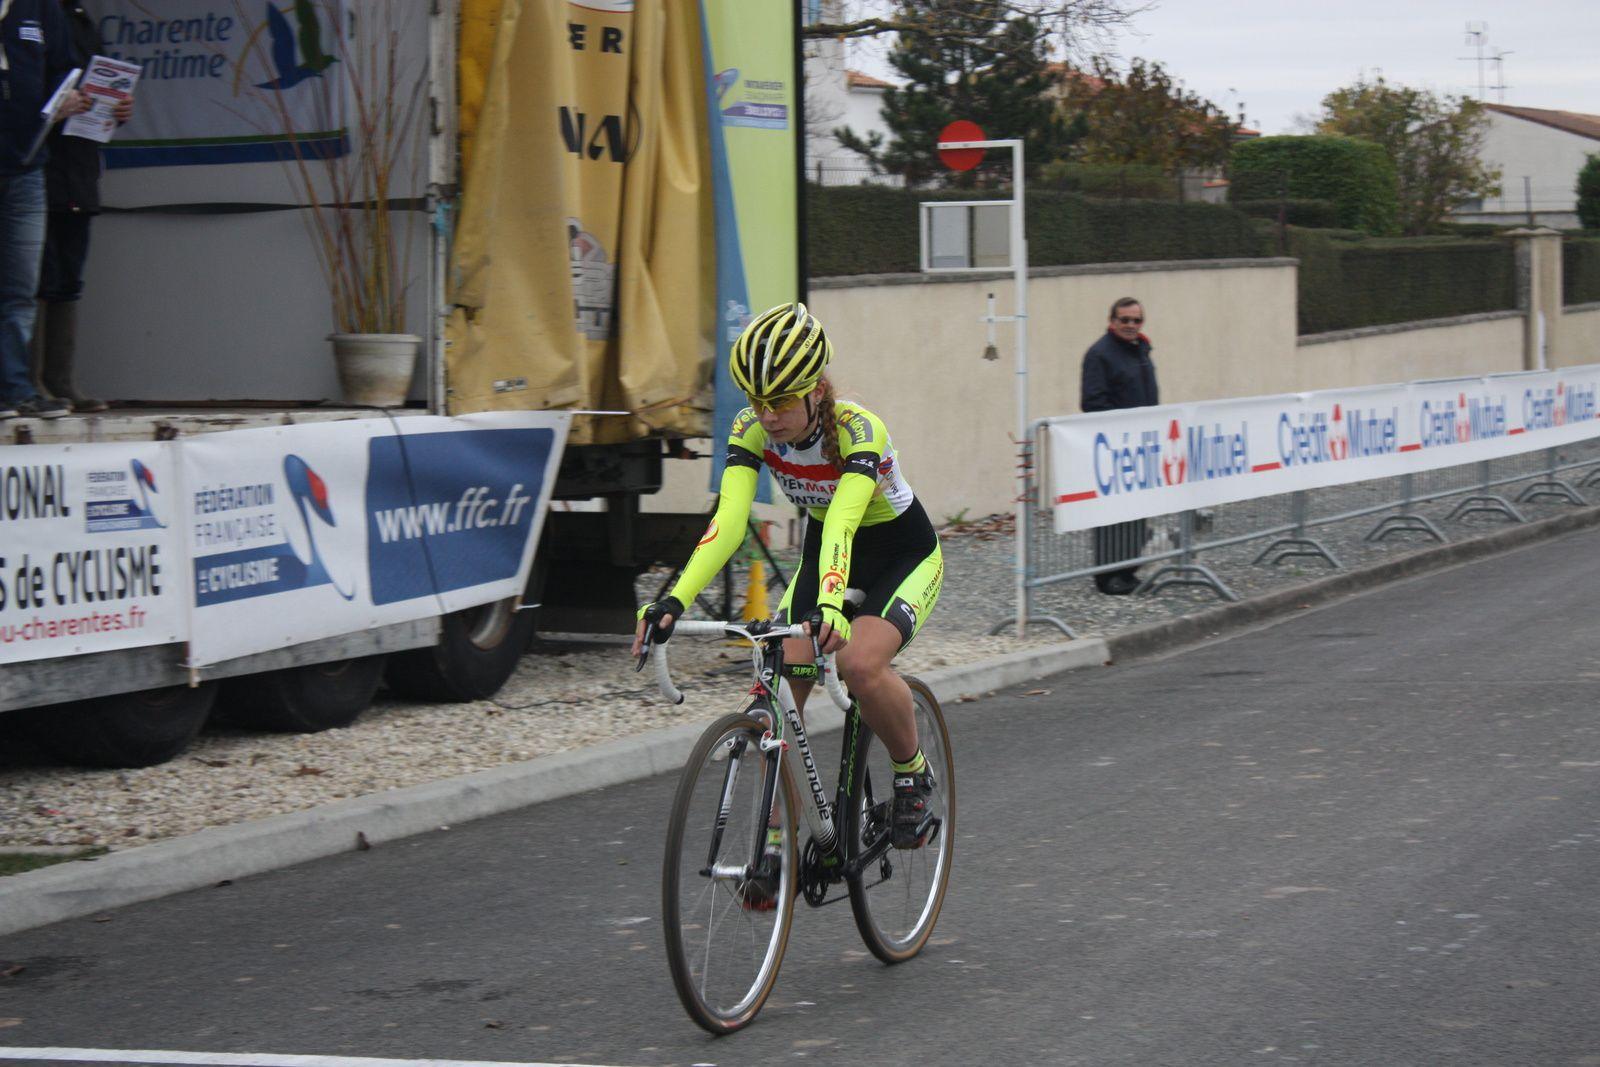 Victoire  de  Victorie  GUILMAN(C  Sud-Saintonge), 2e  Charlotte  BRAVARD(V  Naintré), 3e  Mélanie  BRAVARD(V  Naintré), 4e  Sandra  LEAUD(C  Poitevin), 5e  Aurore  VERHOEVEN(UVA), 6e  Lauréline  LEBORGNE(G  Mansle)  1er  Junior, 7e  Lucie  BOURGOIN(VCCO).